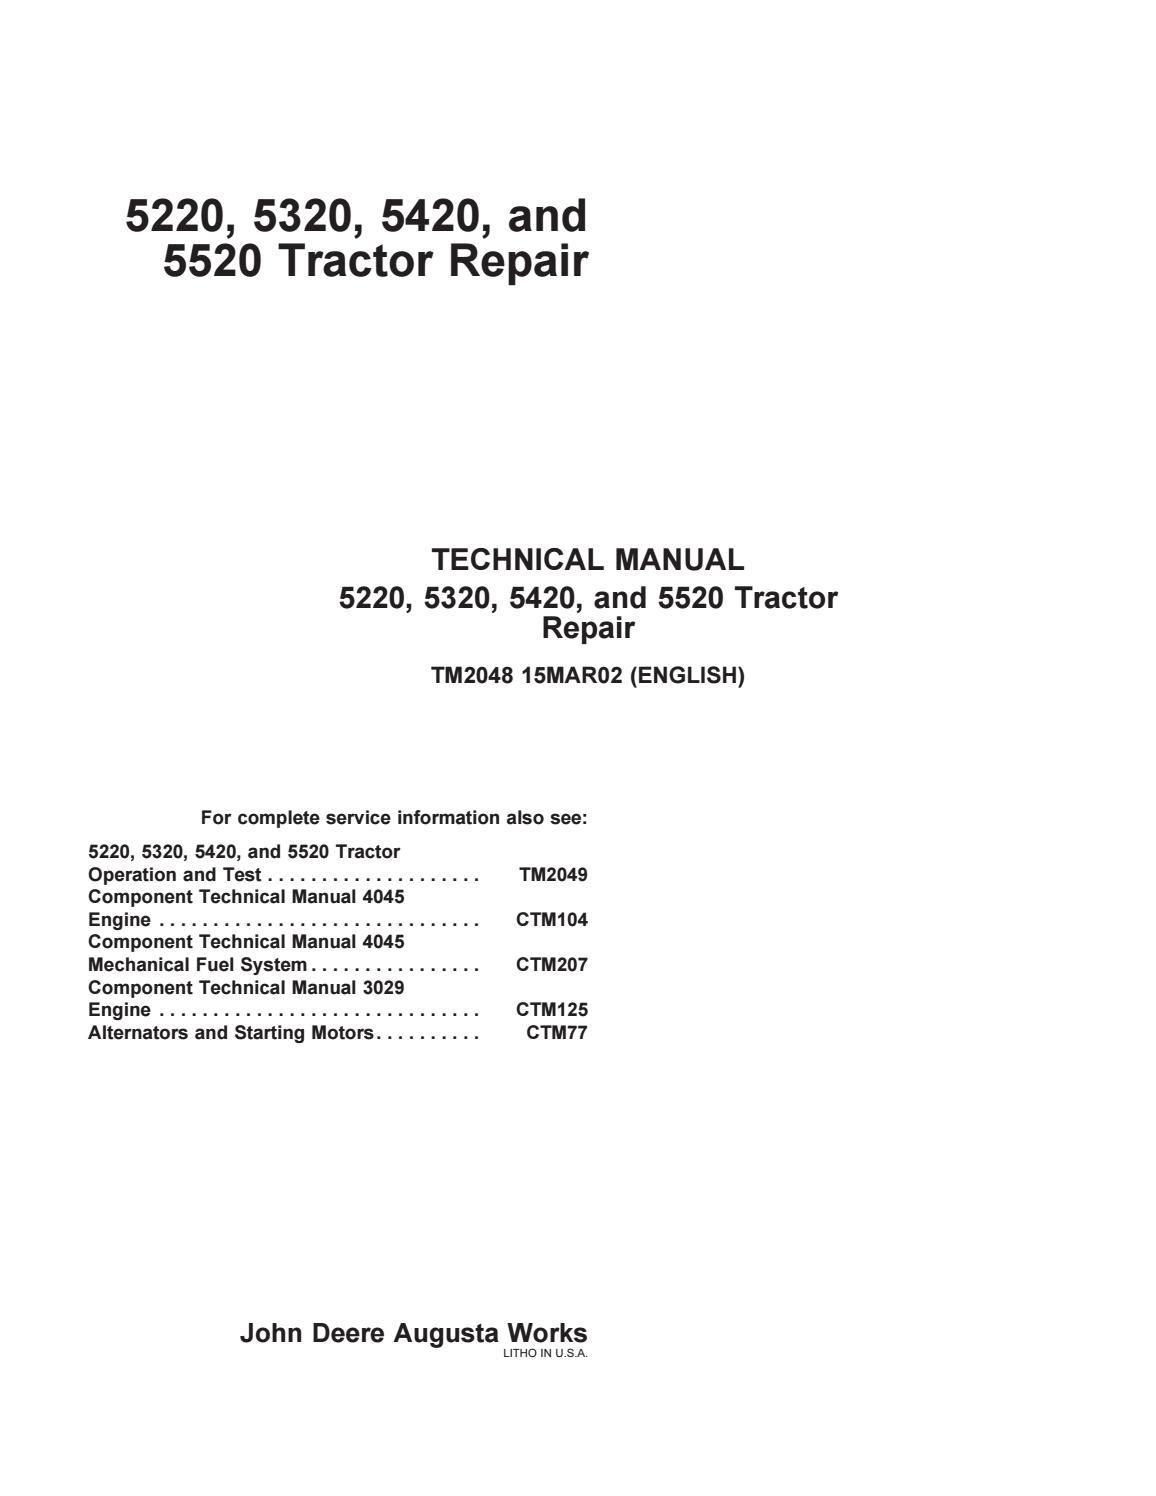 John deere 5320 tractor service repair manual by 163294 - issuu on honda 670 wiring diagram, john deere 670 parts diagram, john deere 670 tractor, john deere 670 radiator, john deere 670 headlight, craftsman table saw wiring diagram, john deere 670 specifications, minneapolis moline 670 wiring diagram, john deere 670 engine,